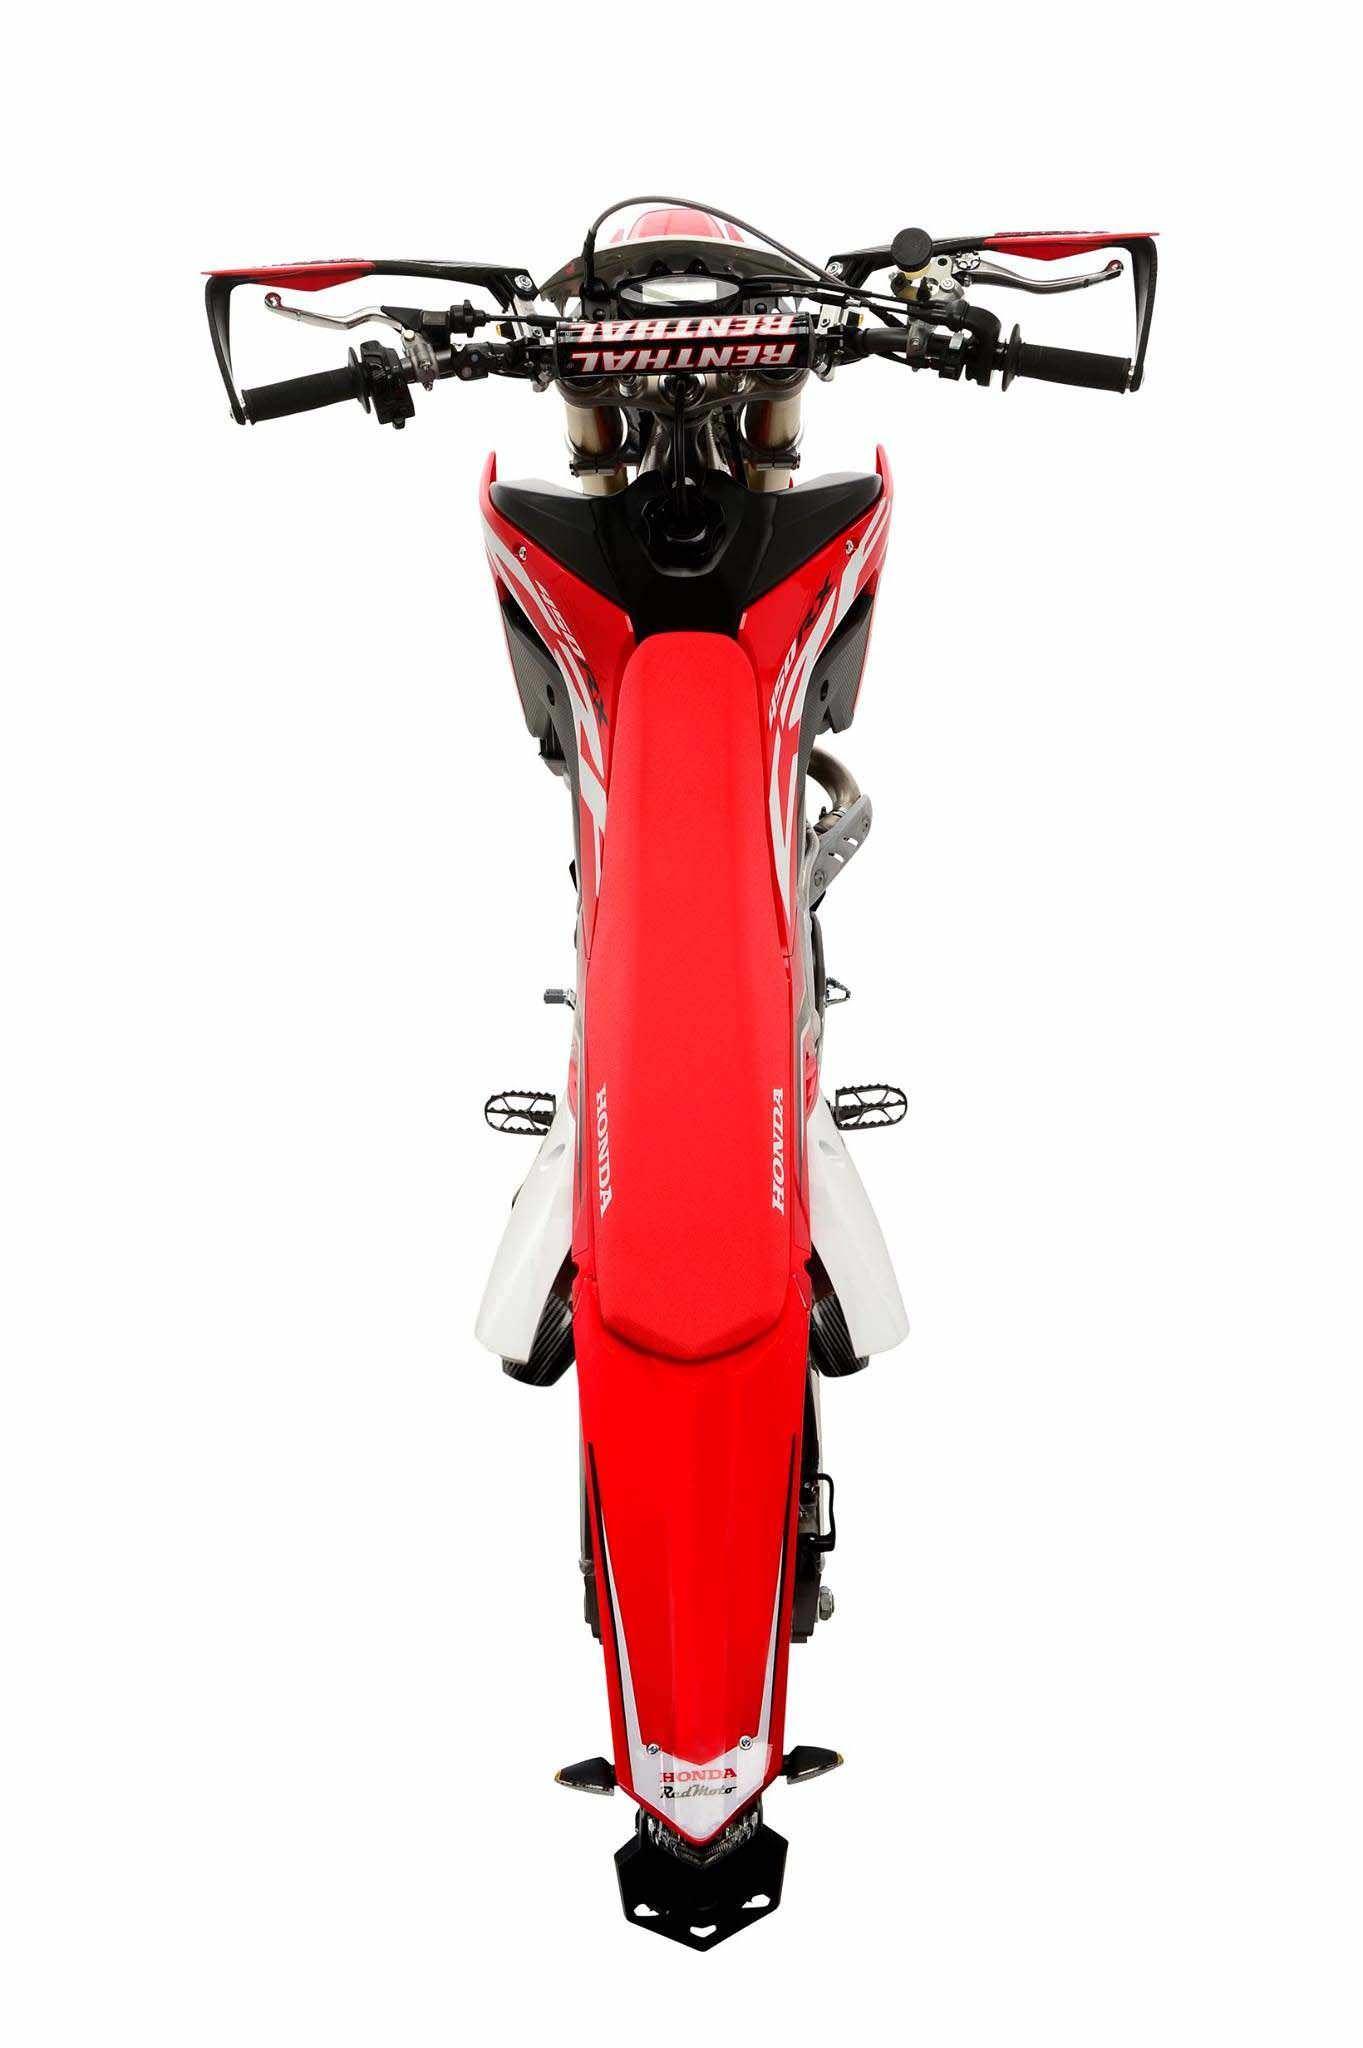 Street-Legal 2017 Honda CRF450R SuperMoto Bike that YOU ...